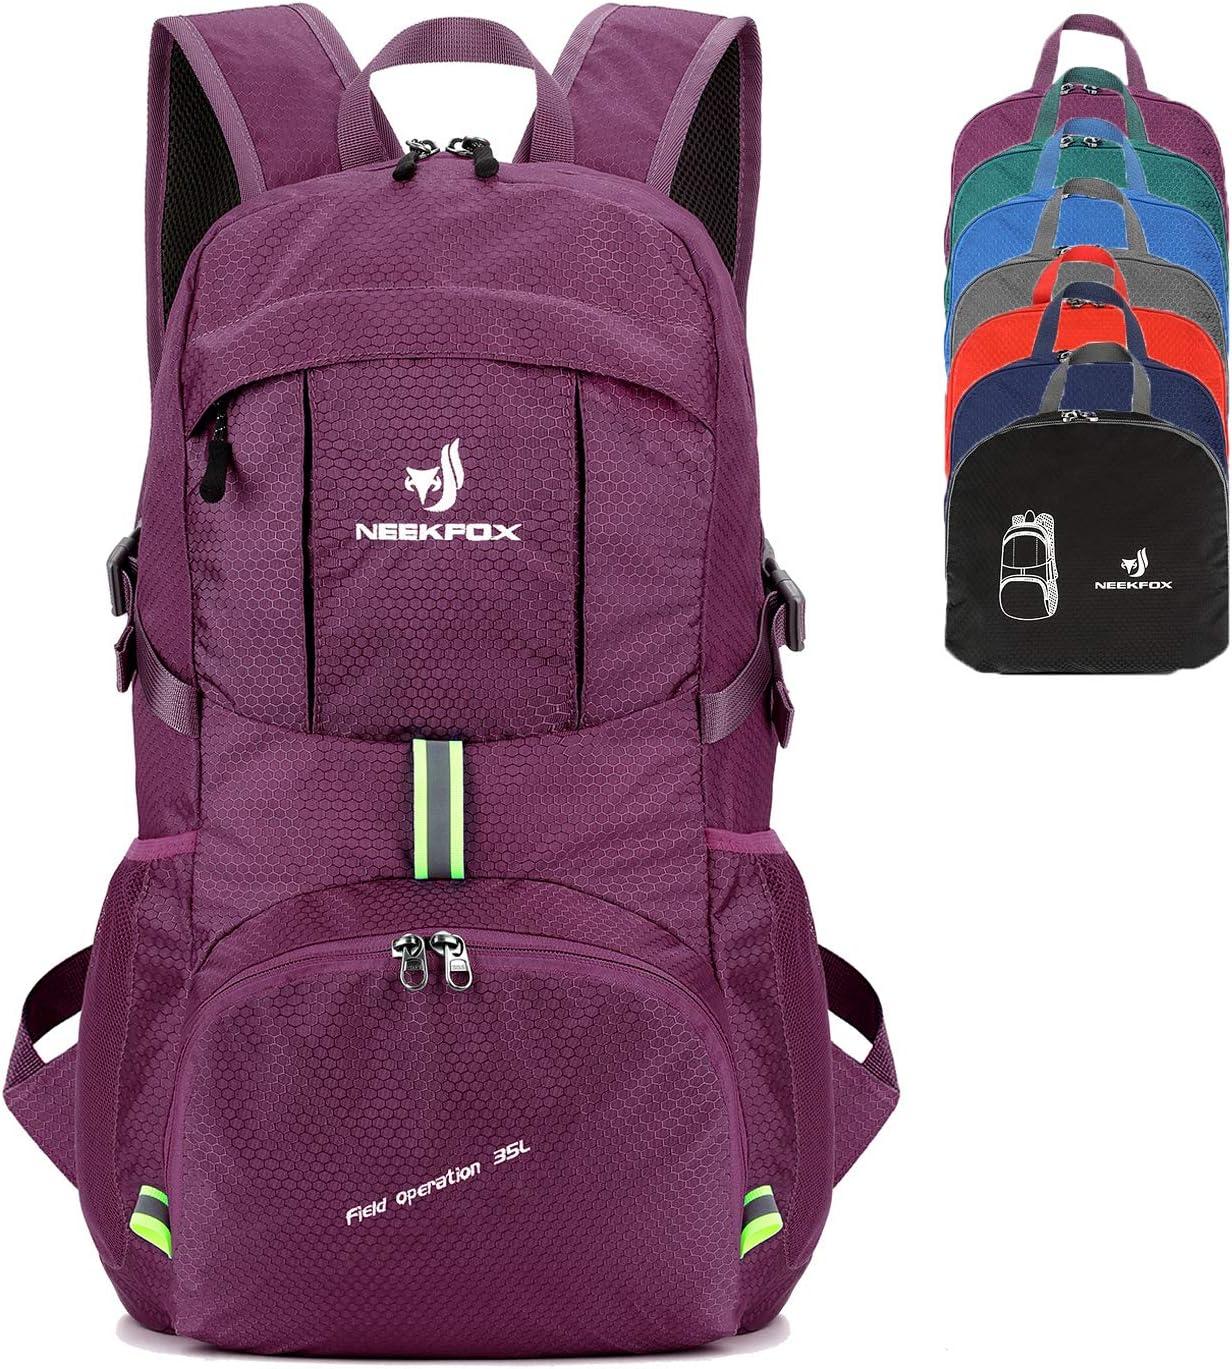 NEEKFOX Packable Lightweight Hiking Daypack 35L Travel Hiking Backpack for Women Men